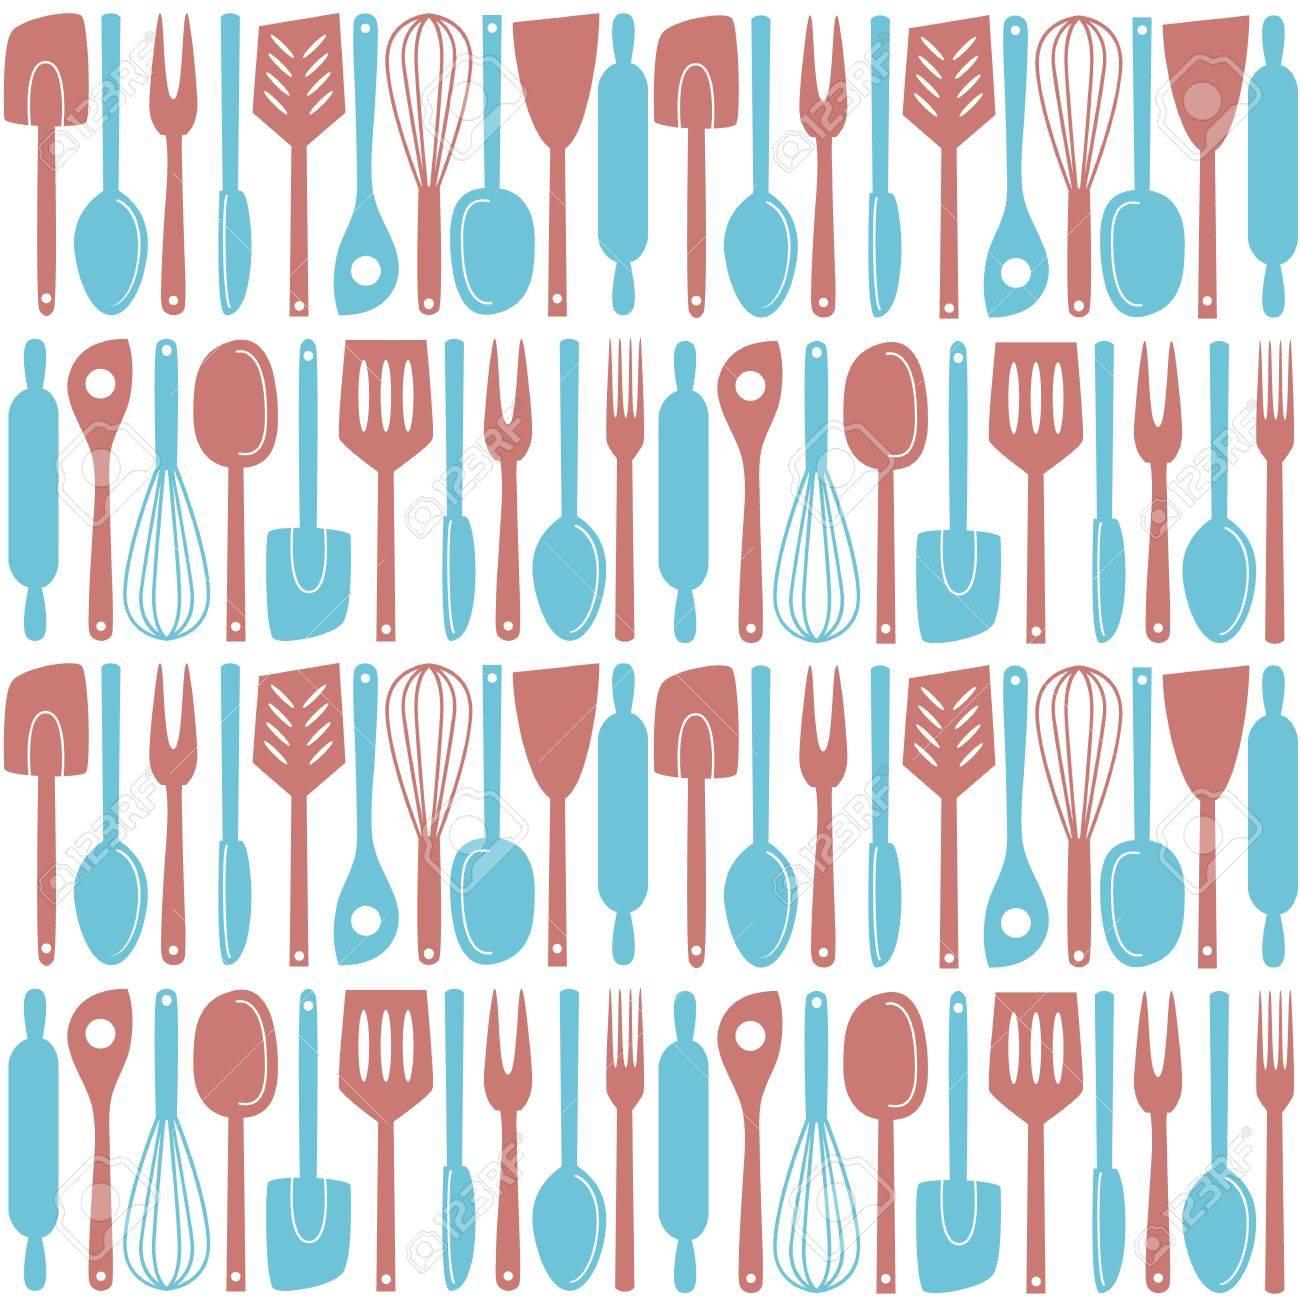 Great Turquoise Kitchen Utensils Images >> Illustration Of Kitchen ...